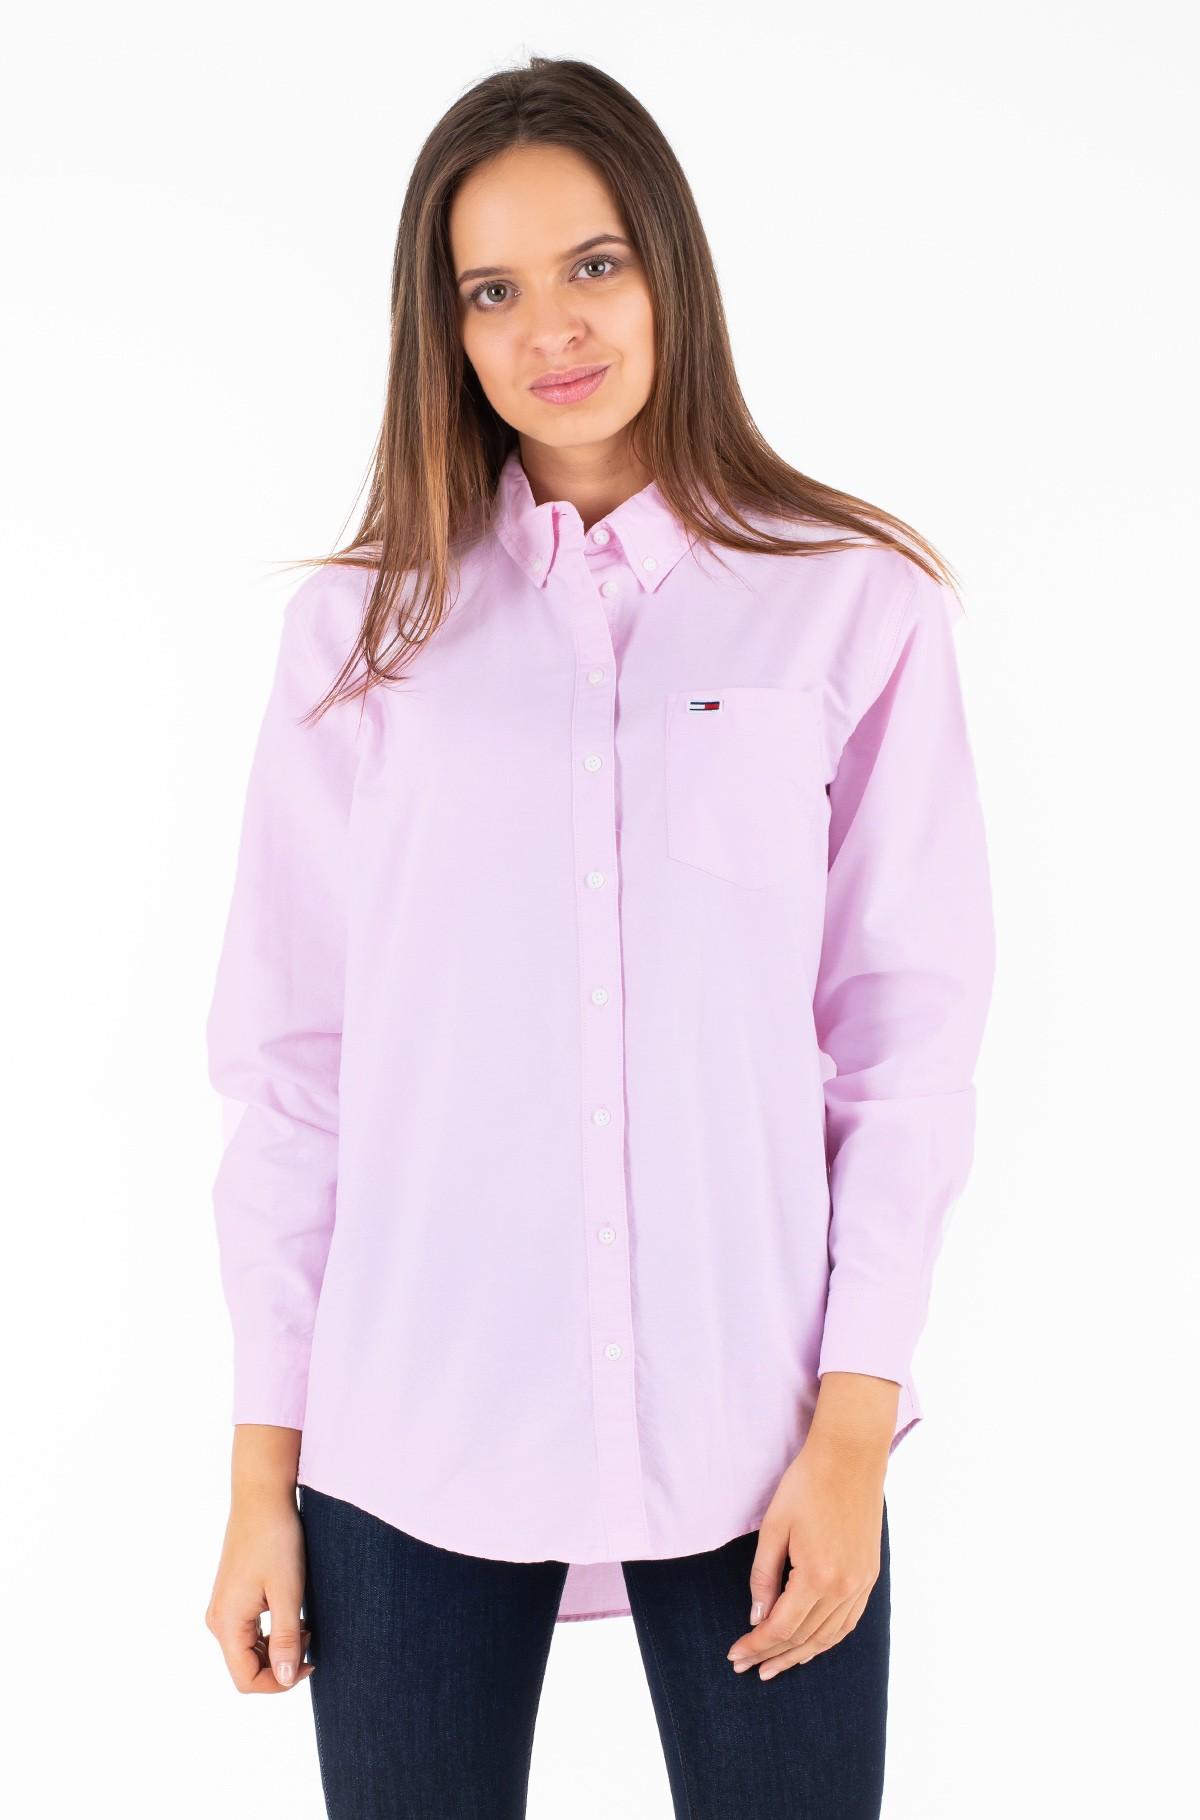 Marškiniai TJW TOMMY CLASSICS SHIRT-full-1